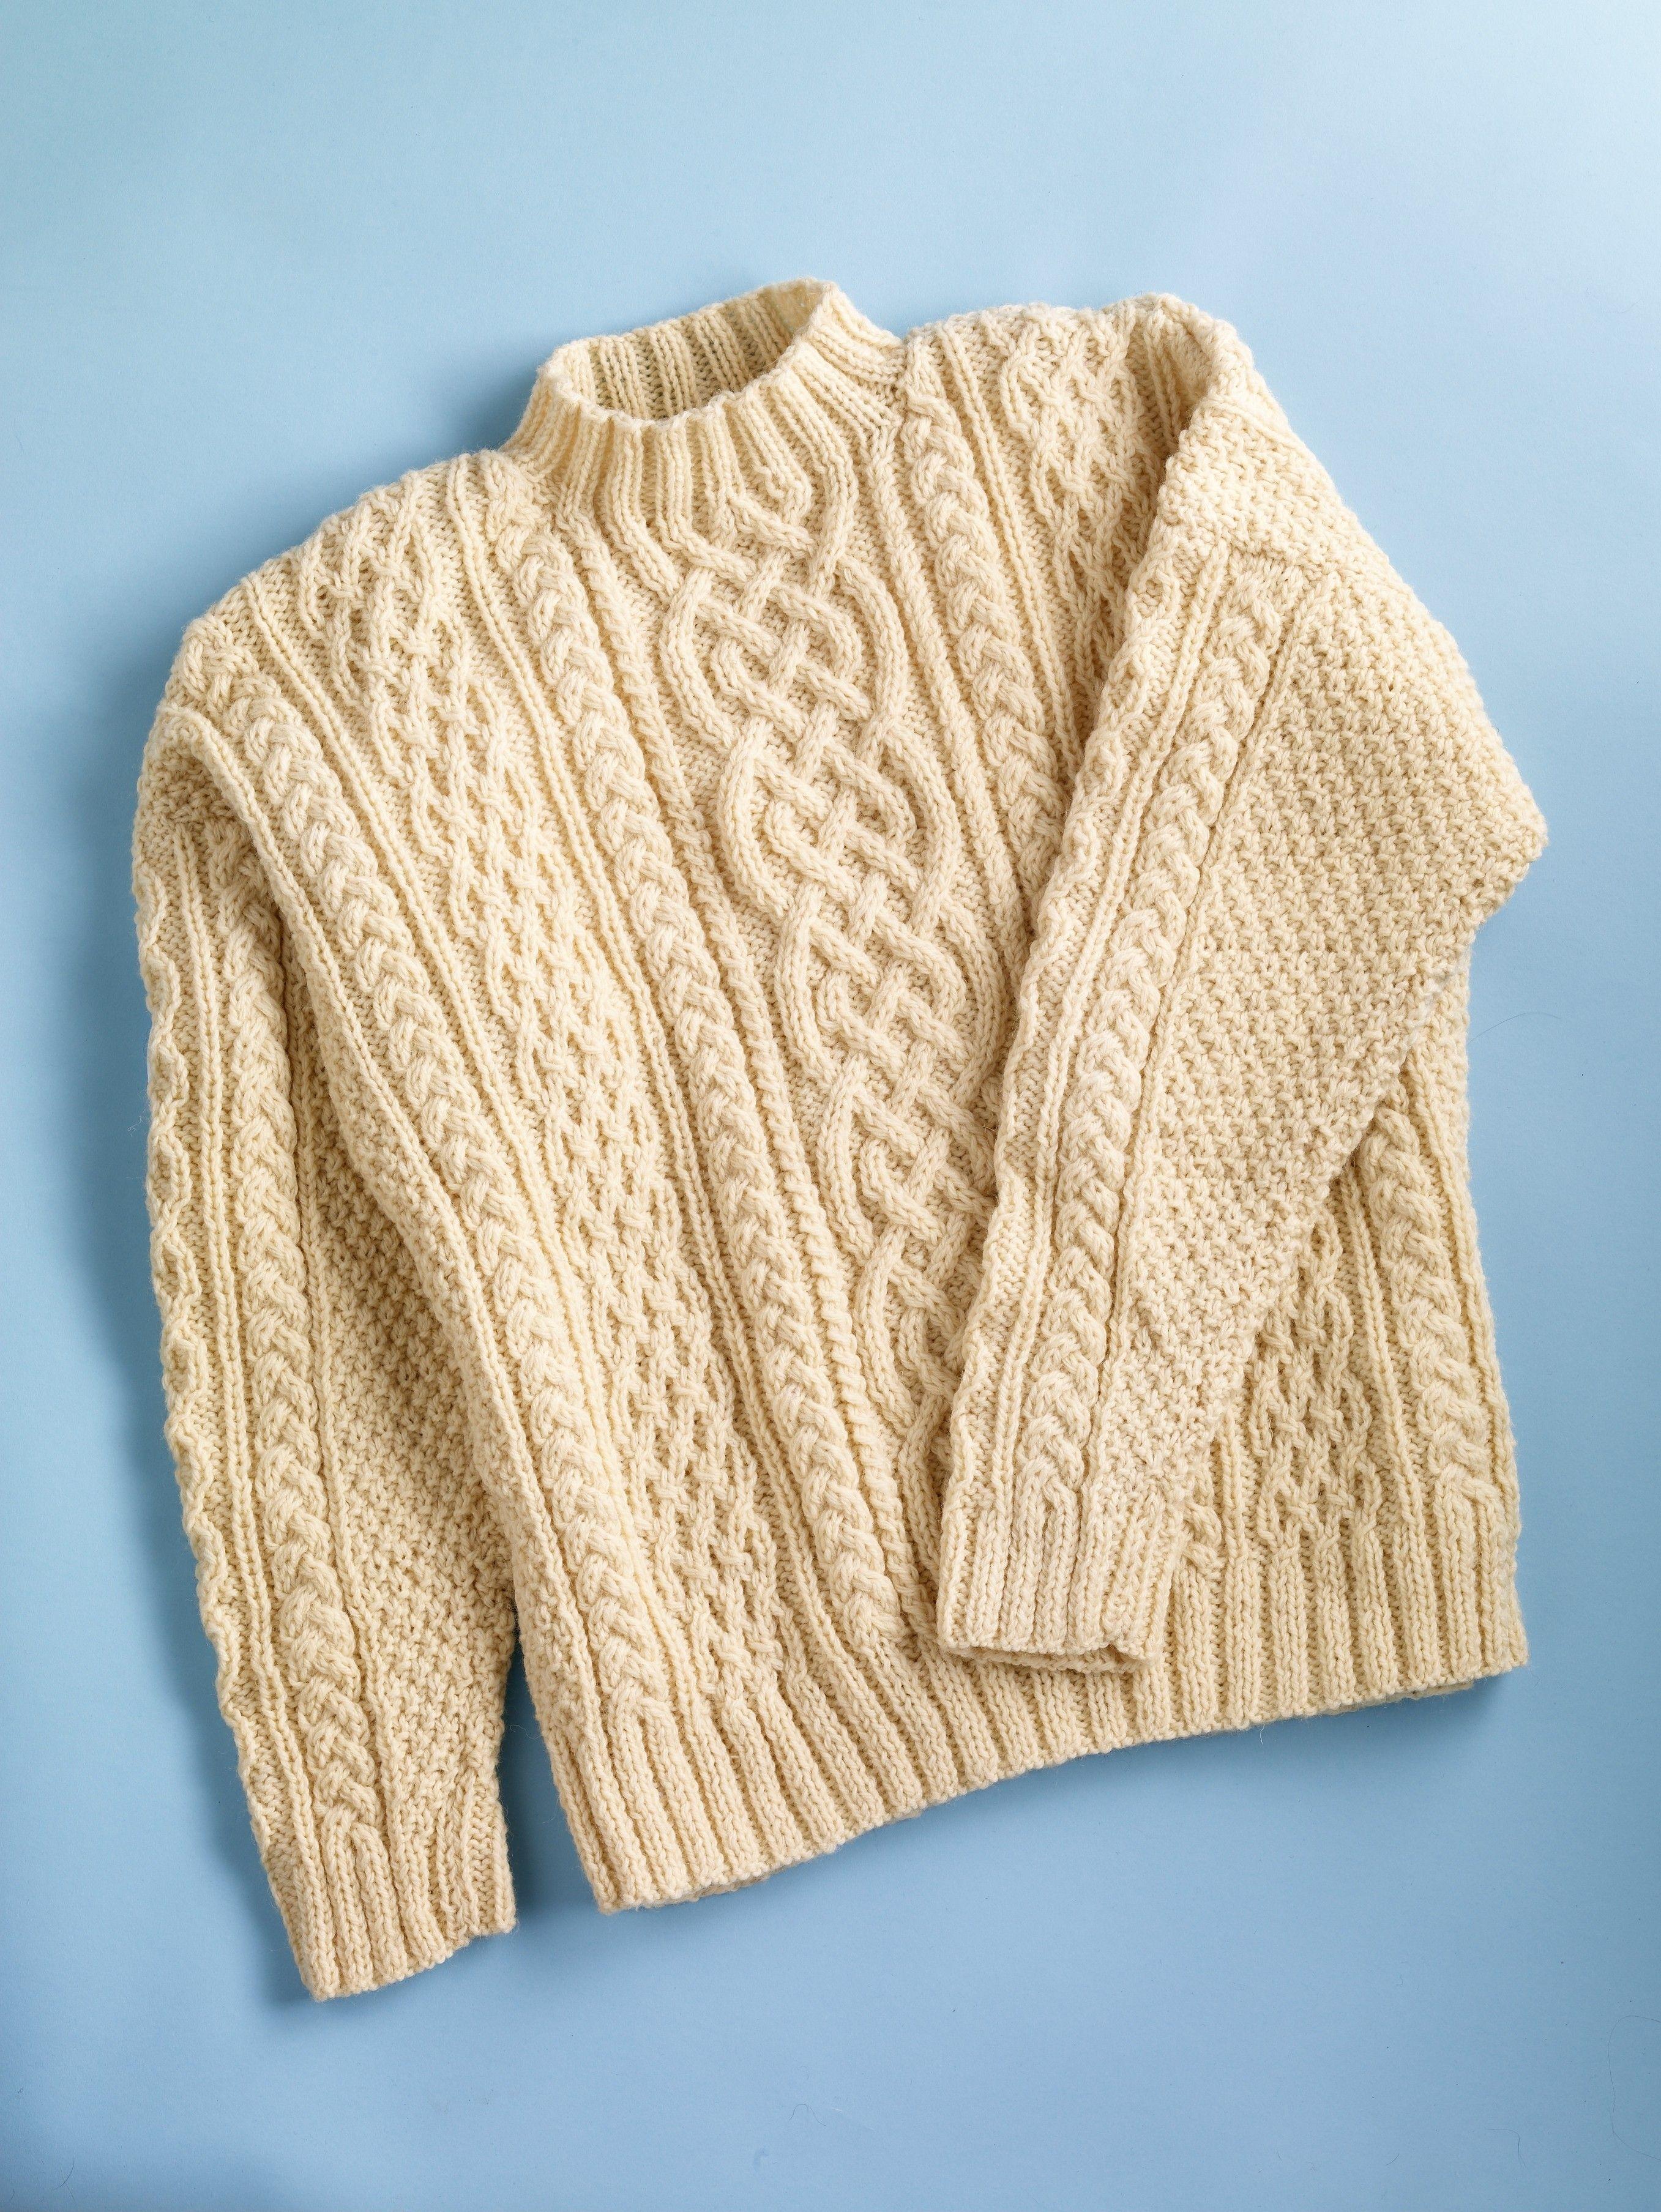 Aran Sweater (Knit) - Patterns - Lion Brand Yarn | cables ...